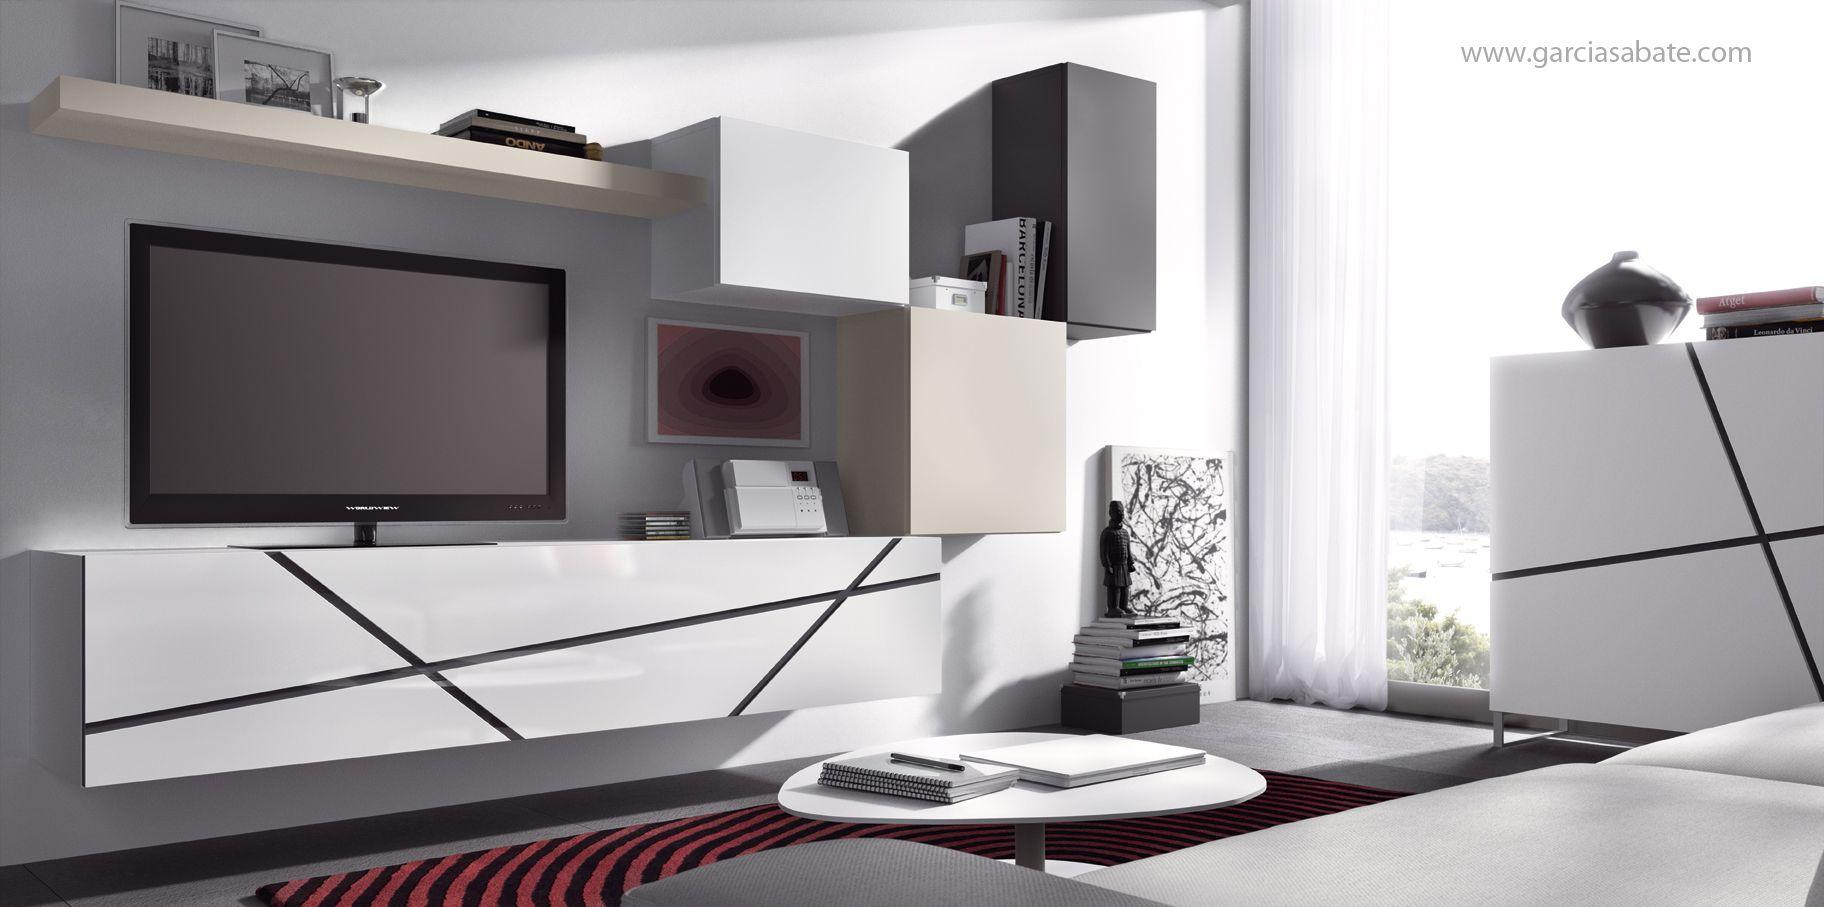 Diseo Salon Muebles Modernos Tele Composiciones Televisin Cool  # Muebles Puchades